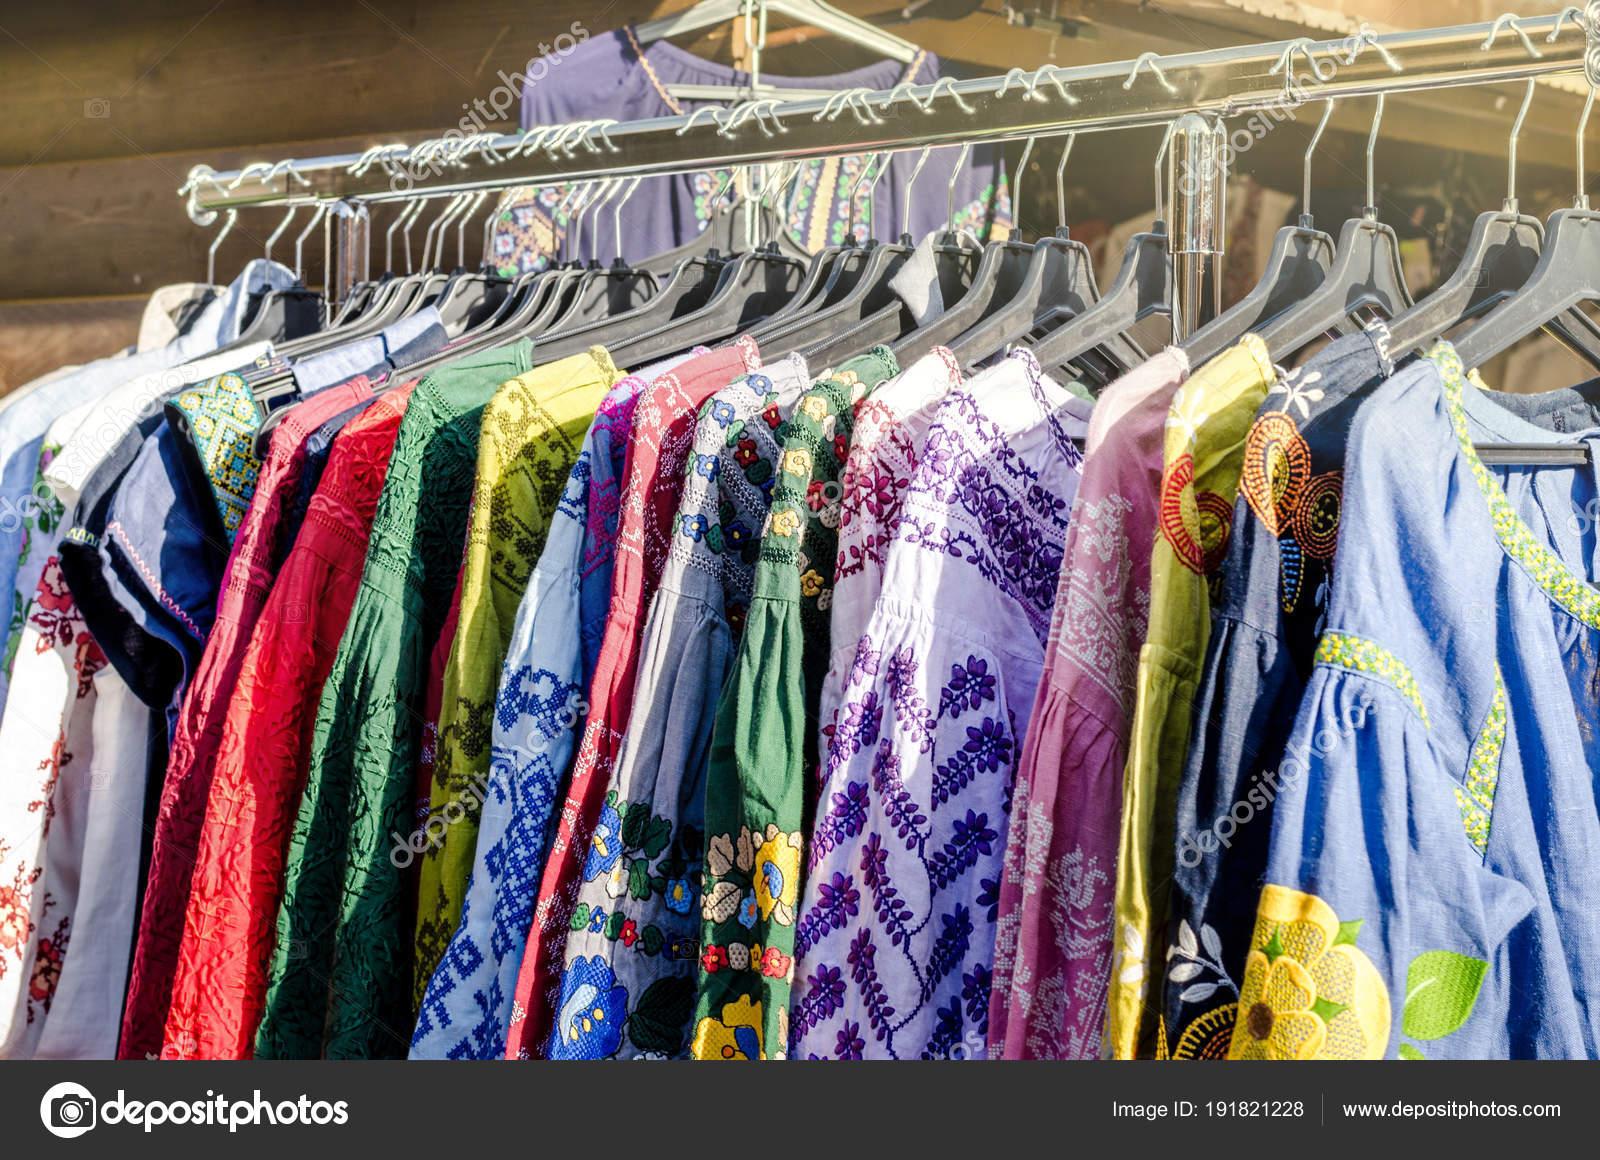 75cc78701d Κρεμάστρες Διαφορετικό Τρόπο Κομψό Γυναικεία Ρούχα Ρούχα Ράφι Γυναίκες  Χειροποίητα– εικόνα αρχείου